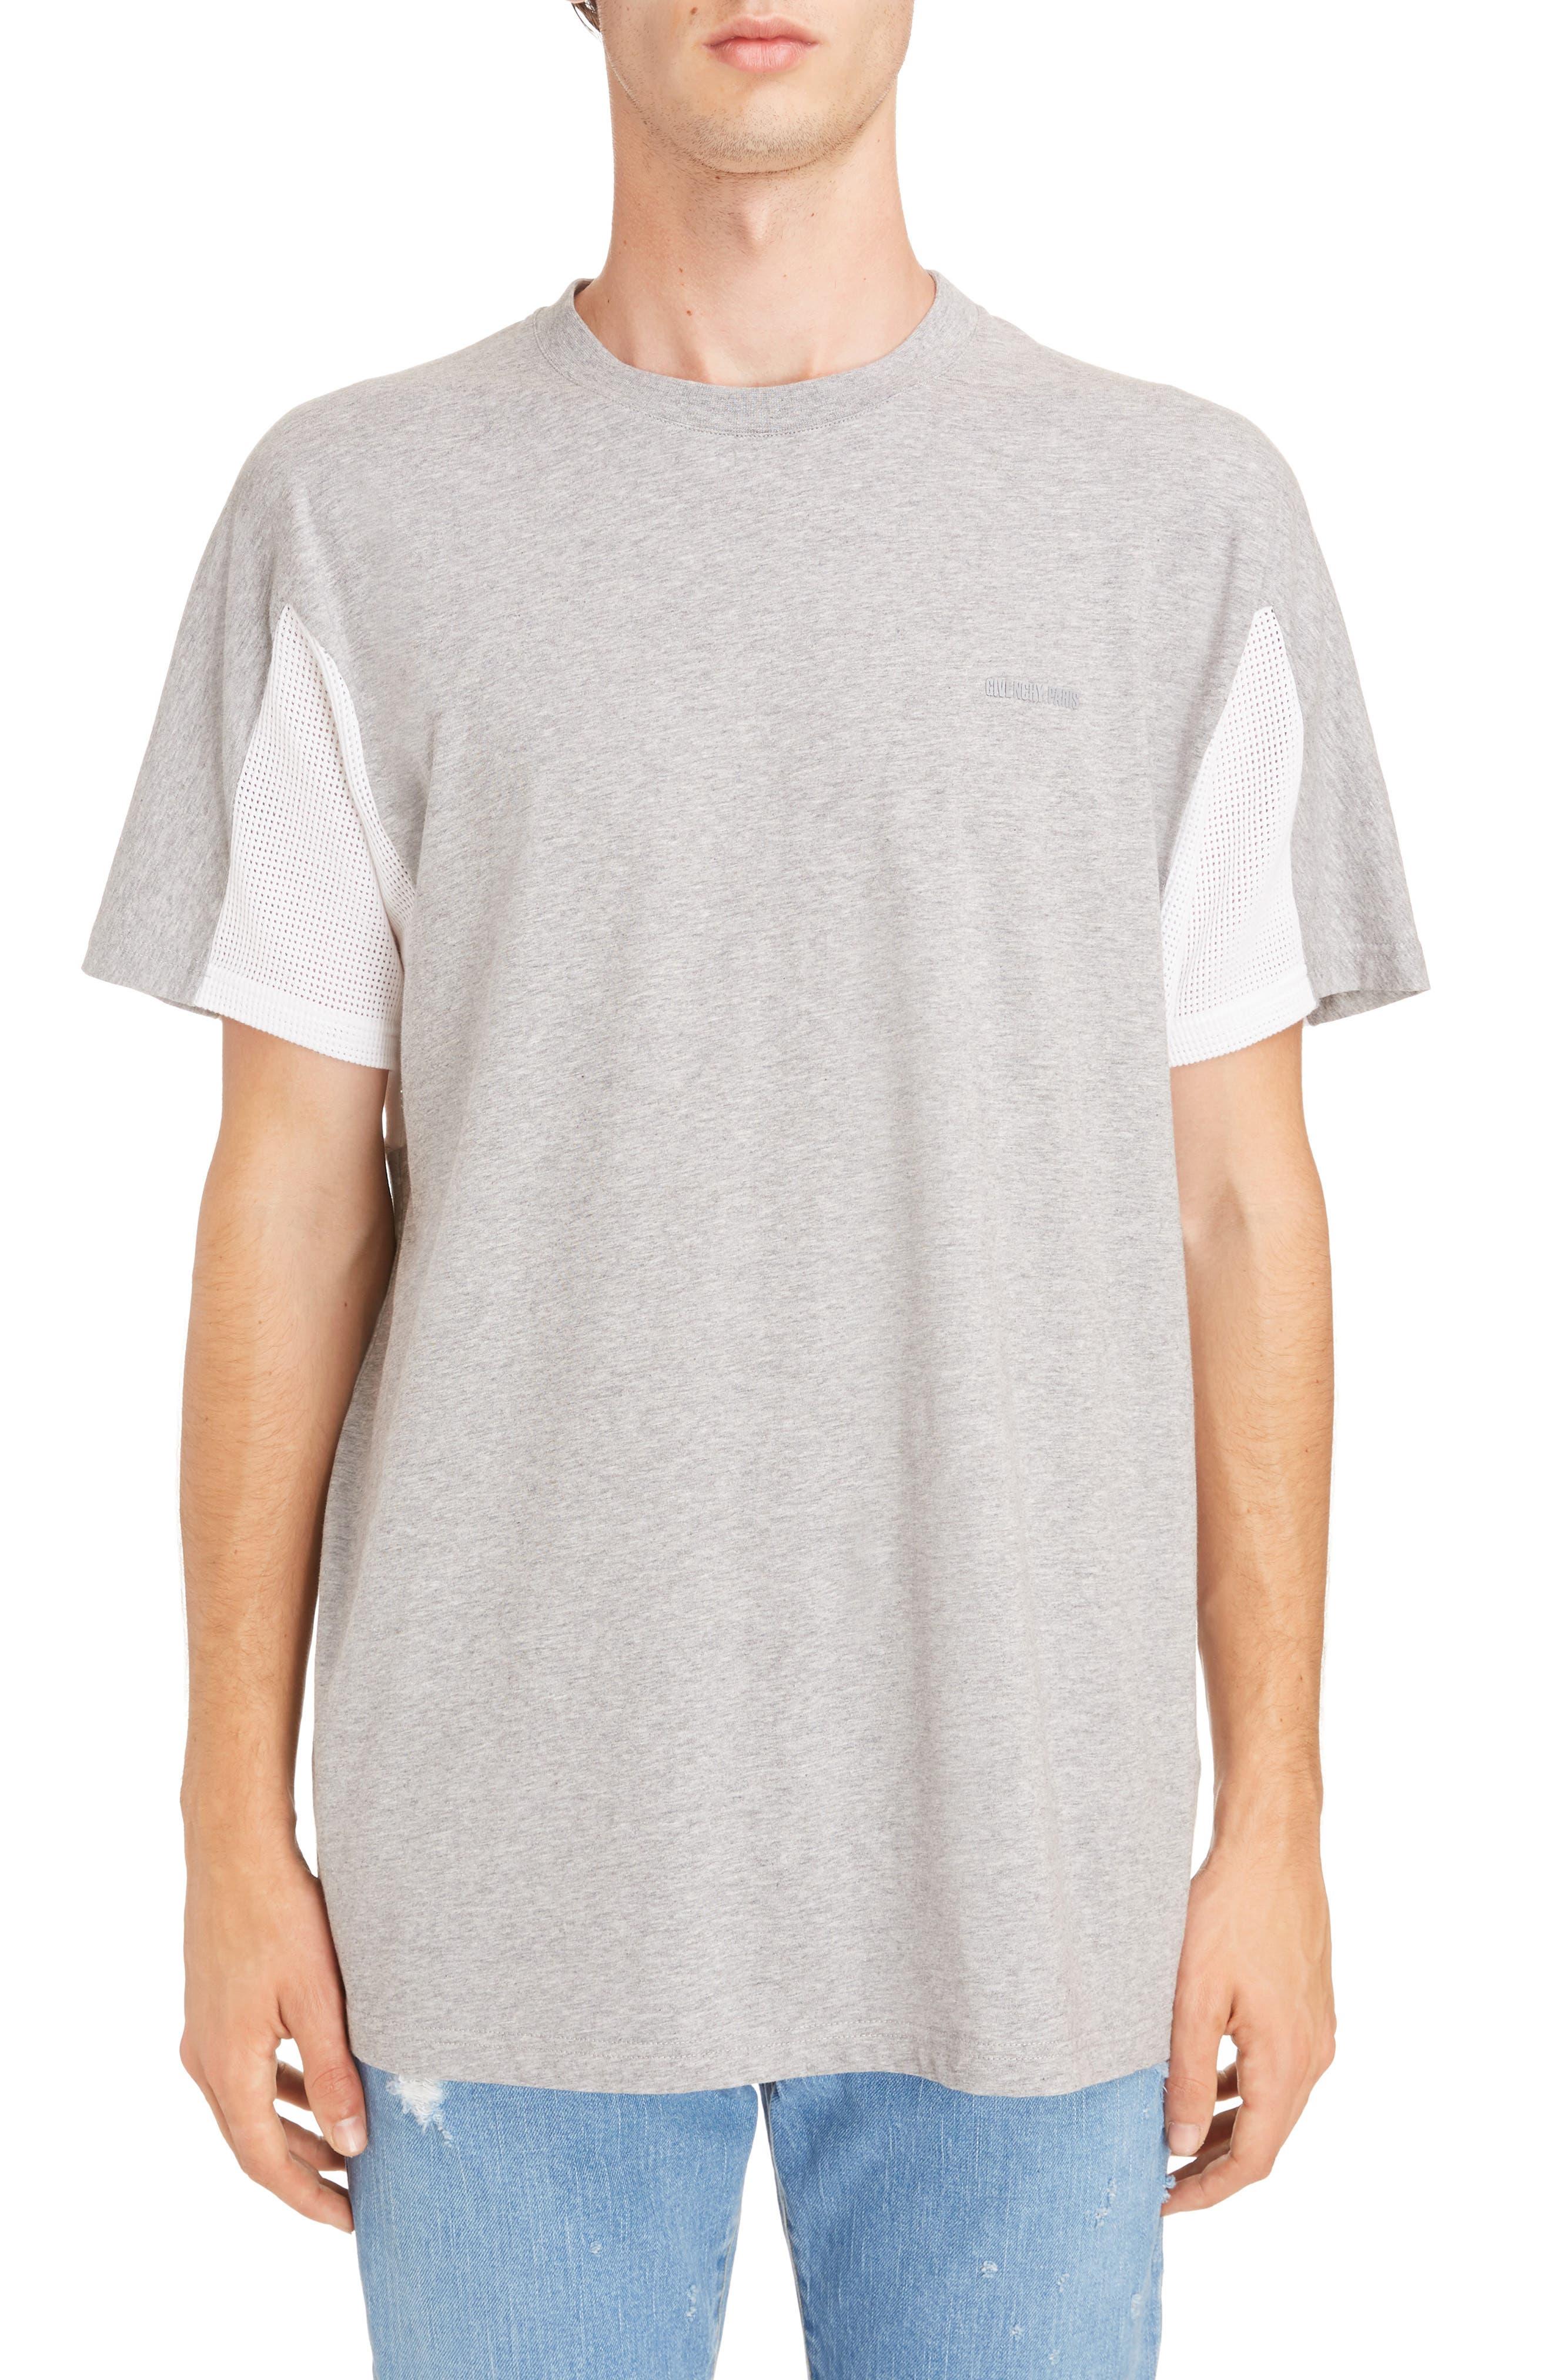 Givenchy Mesh Jersey Crewneck T-Shirt